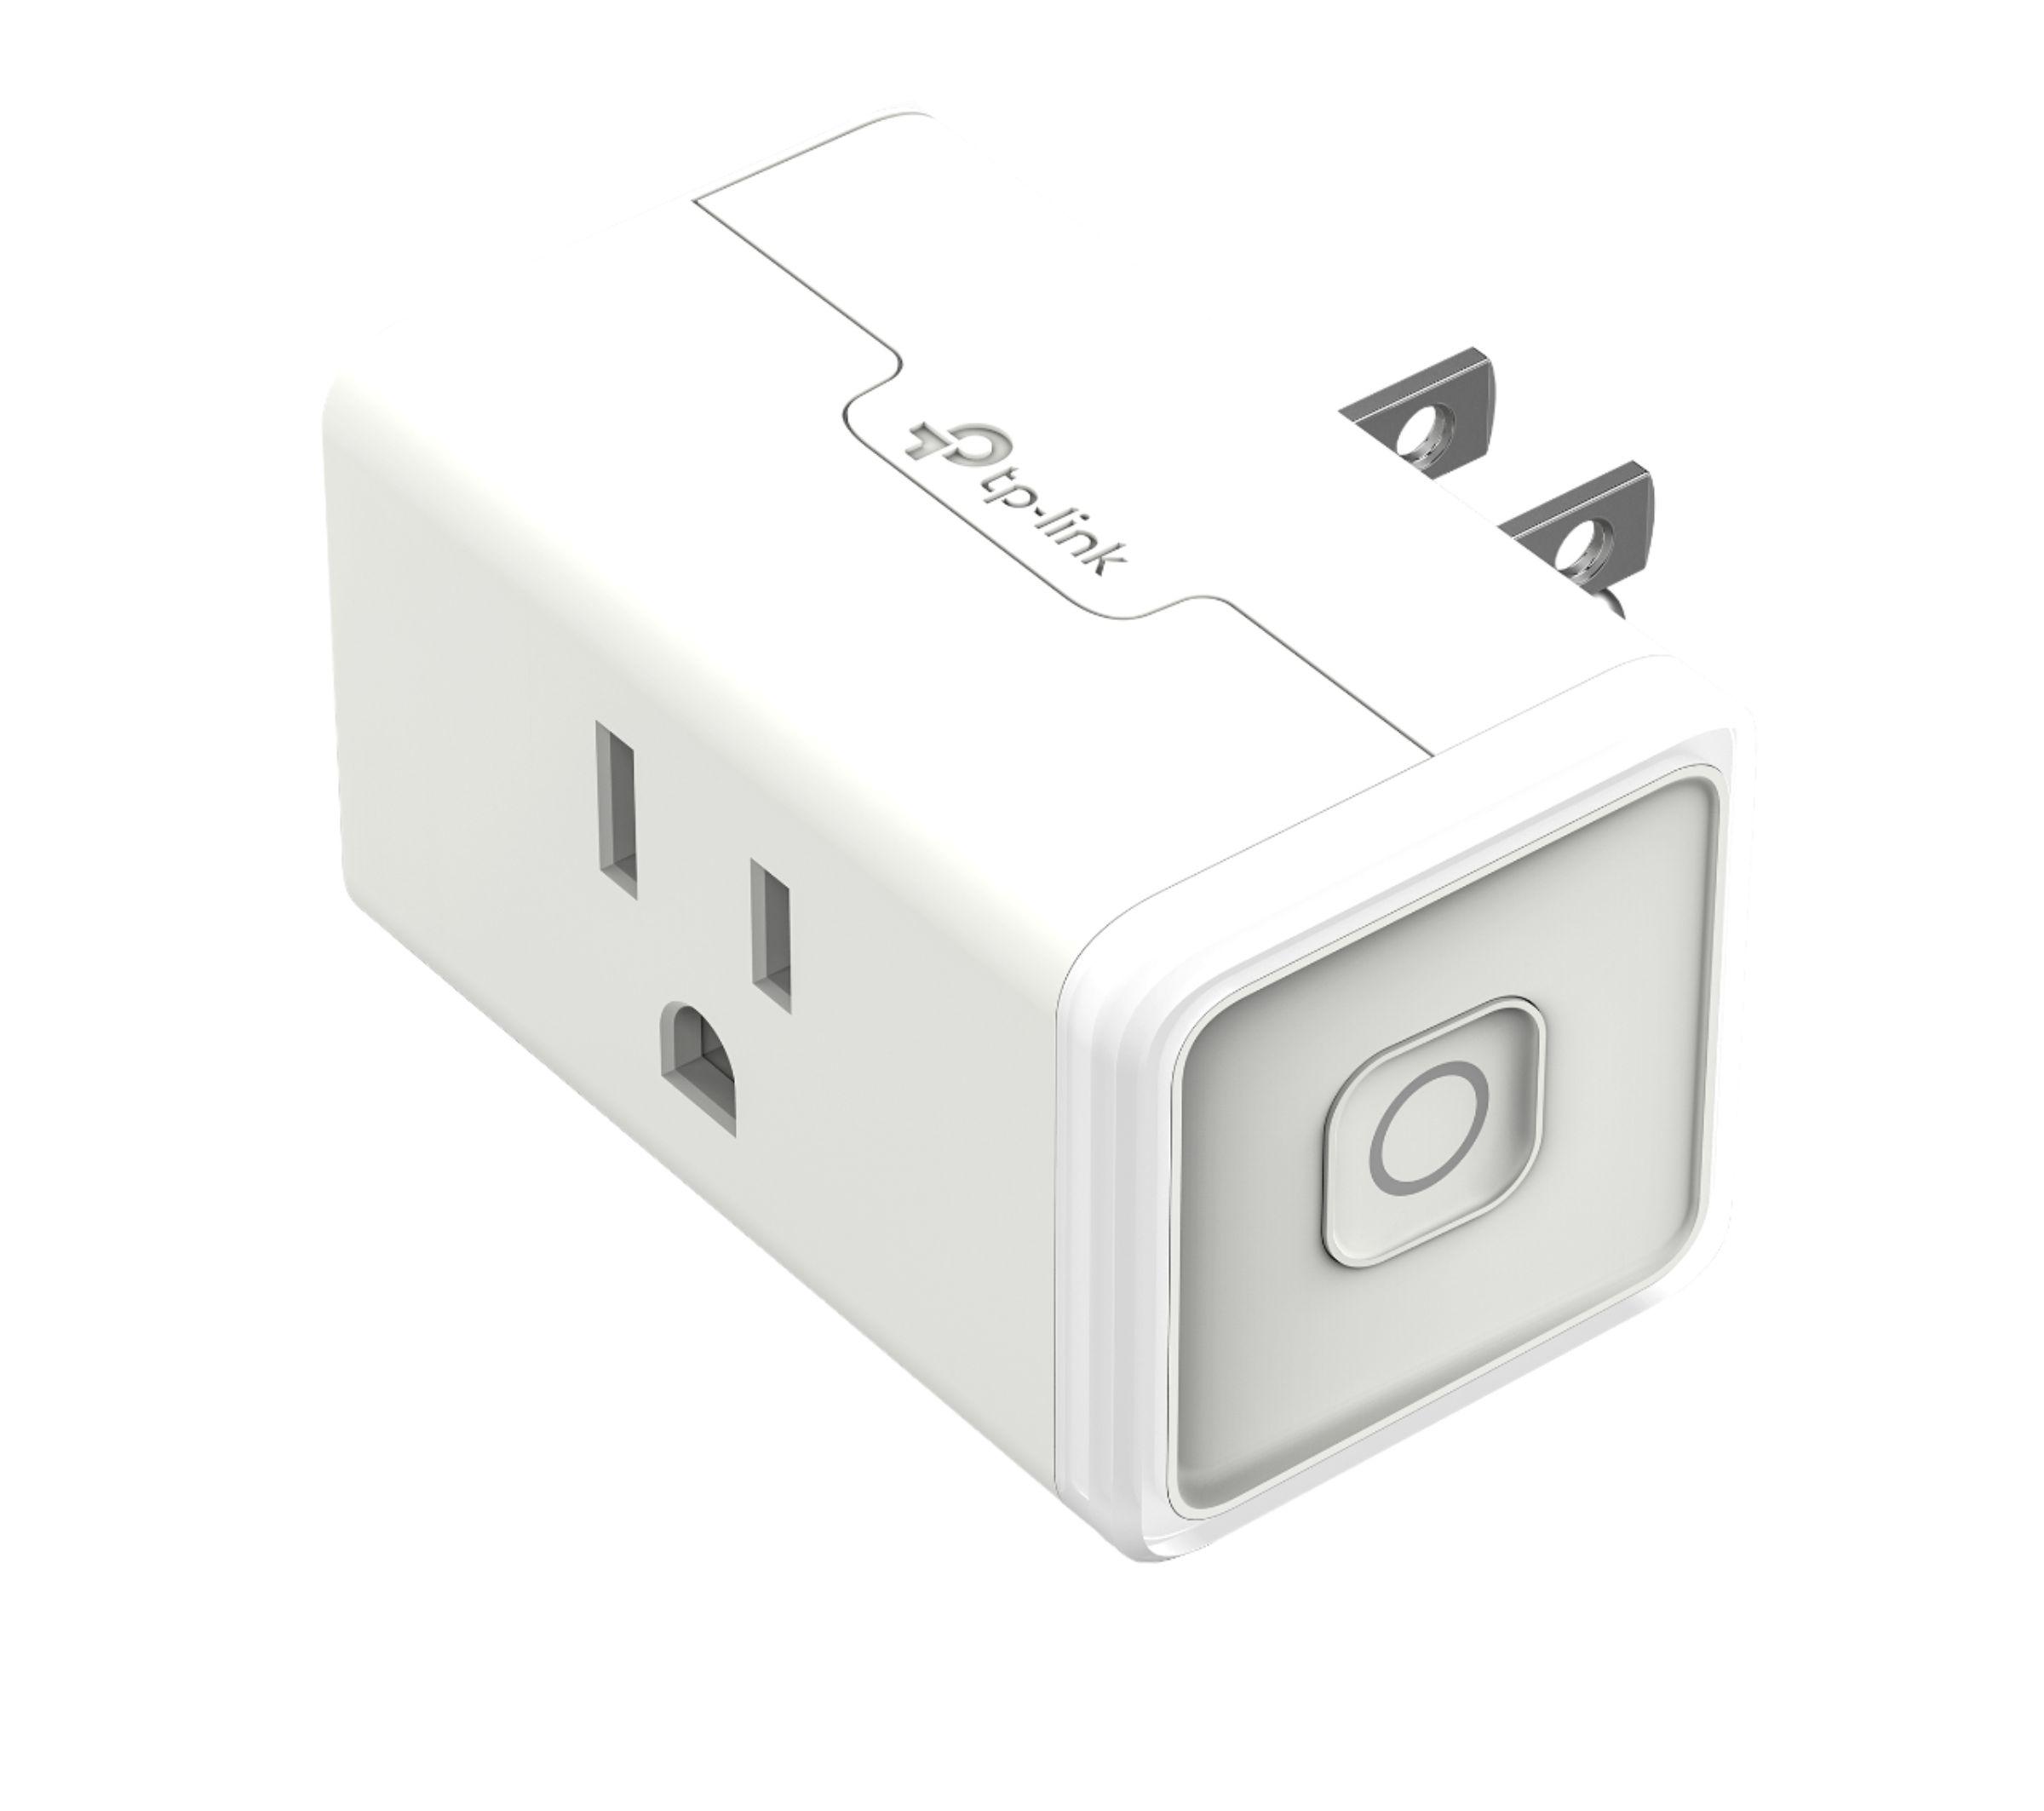 TP-Link Kasa Smart Wi-Fi Plug